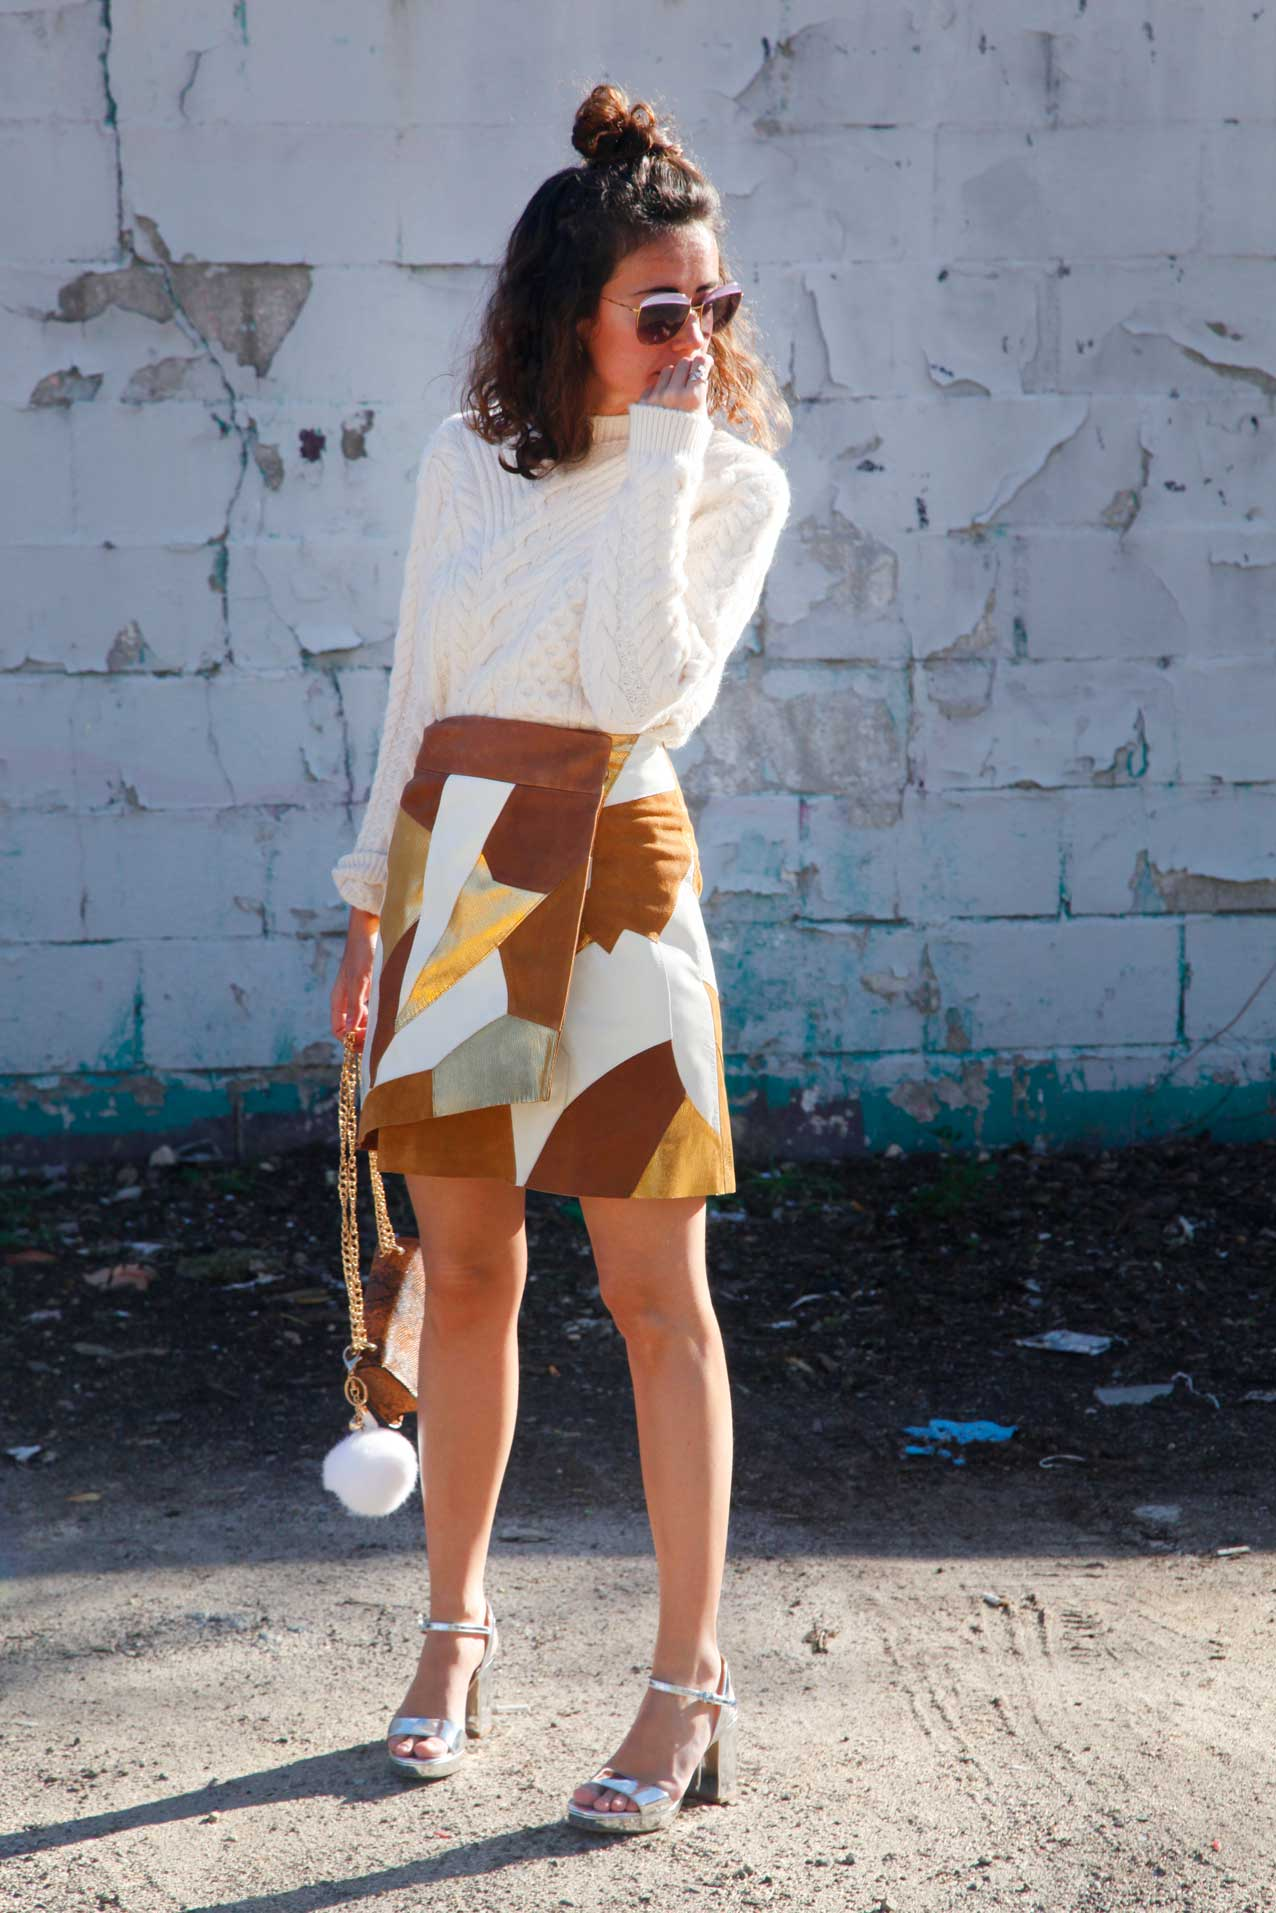 Rodarte_other_Stories-Suede_skirt-Streetstyle-Summer-Cool_lemonade